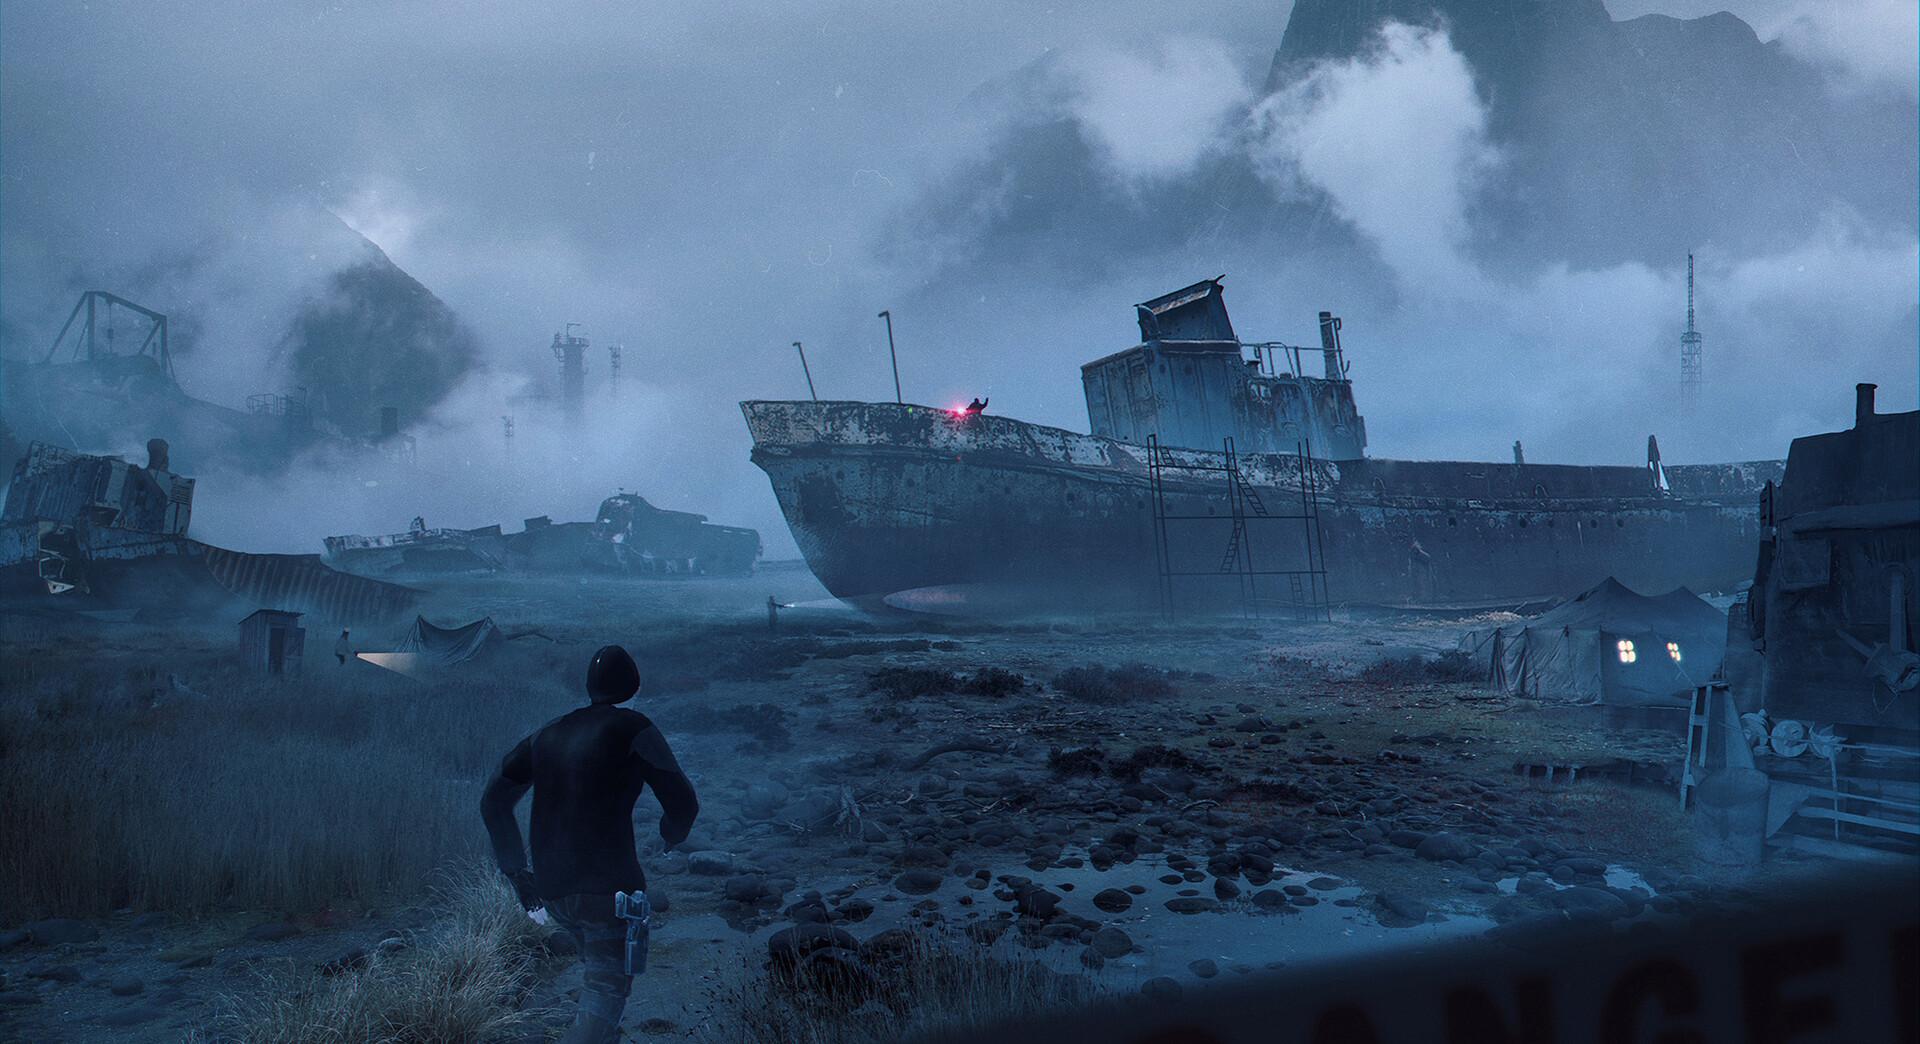 Yeve drovossekova ship yard